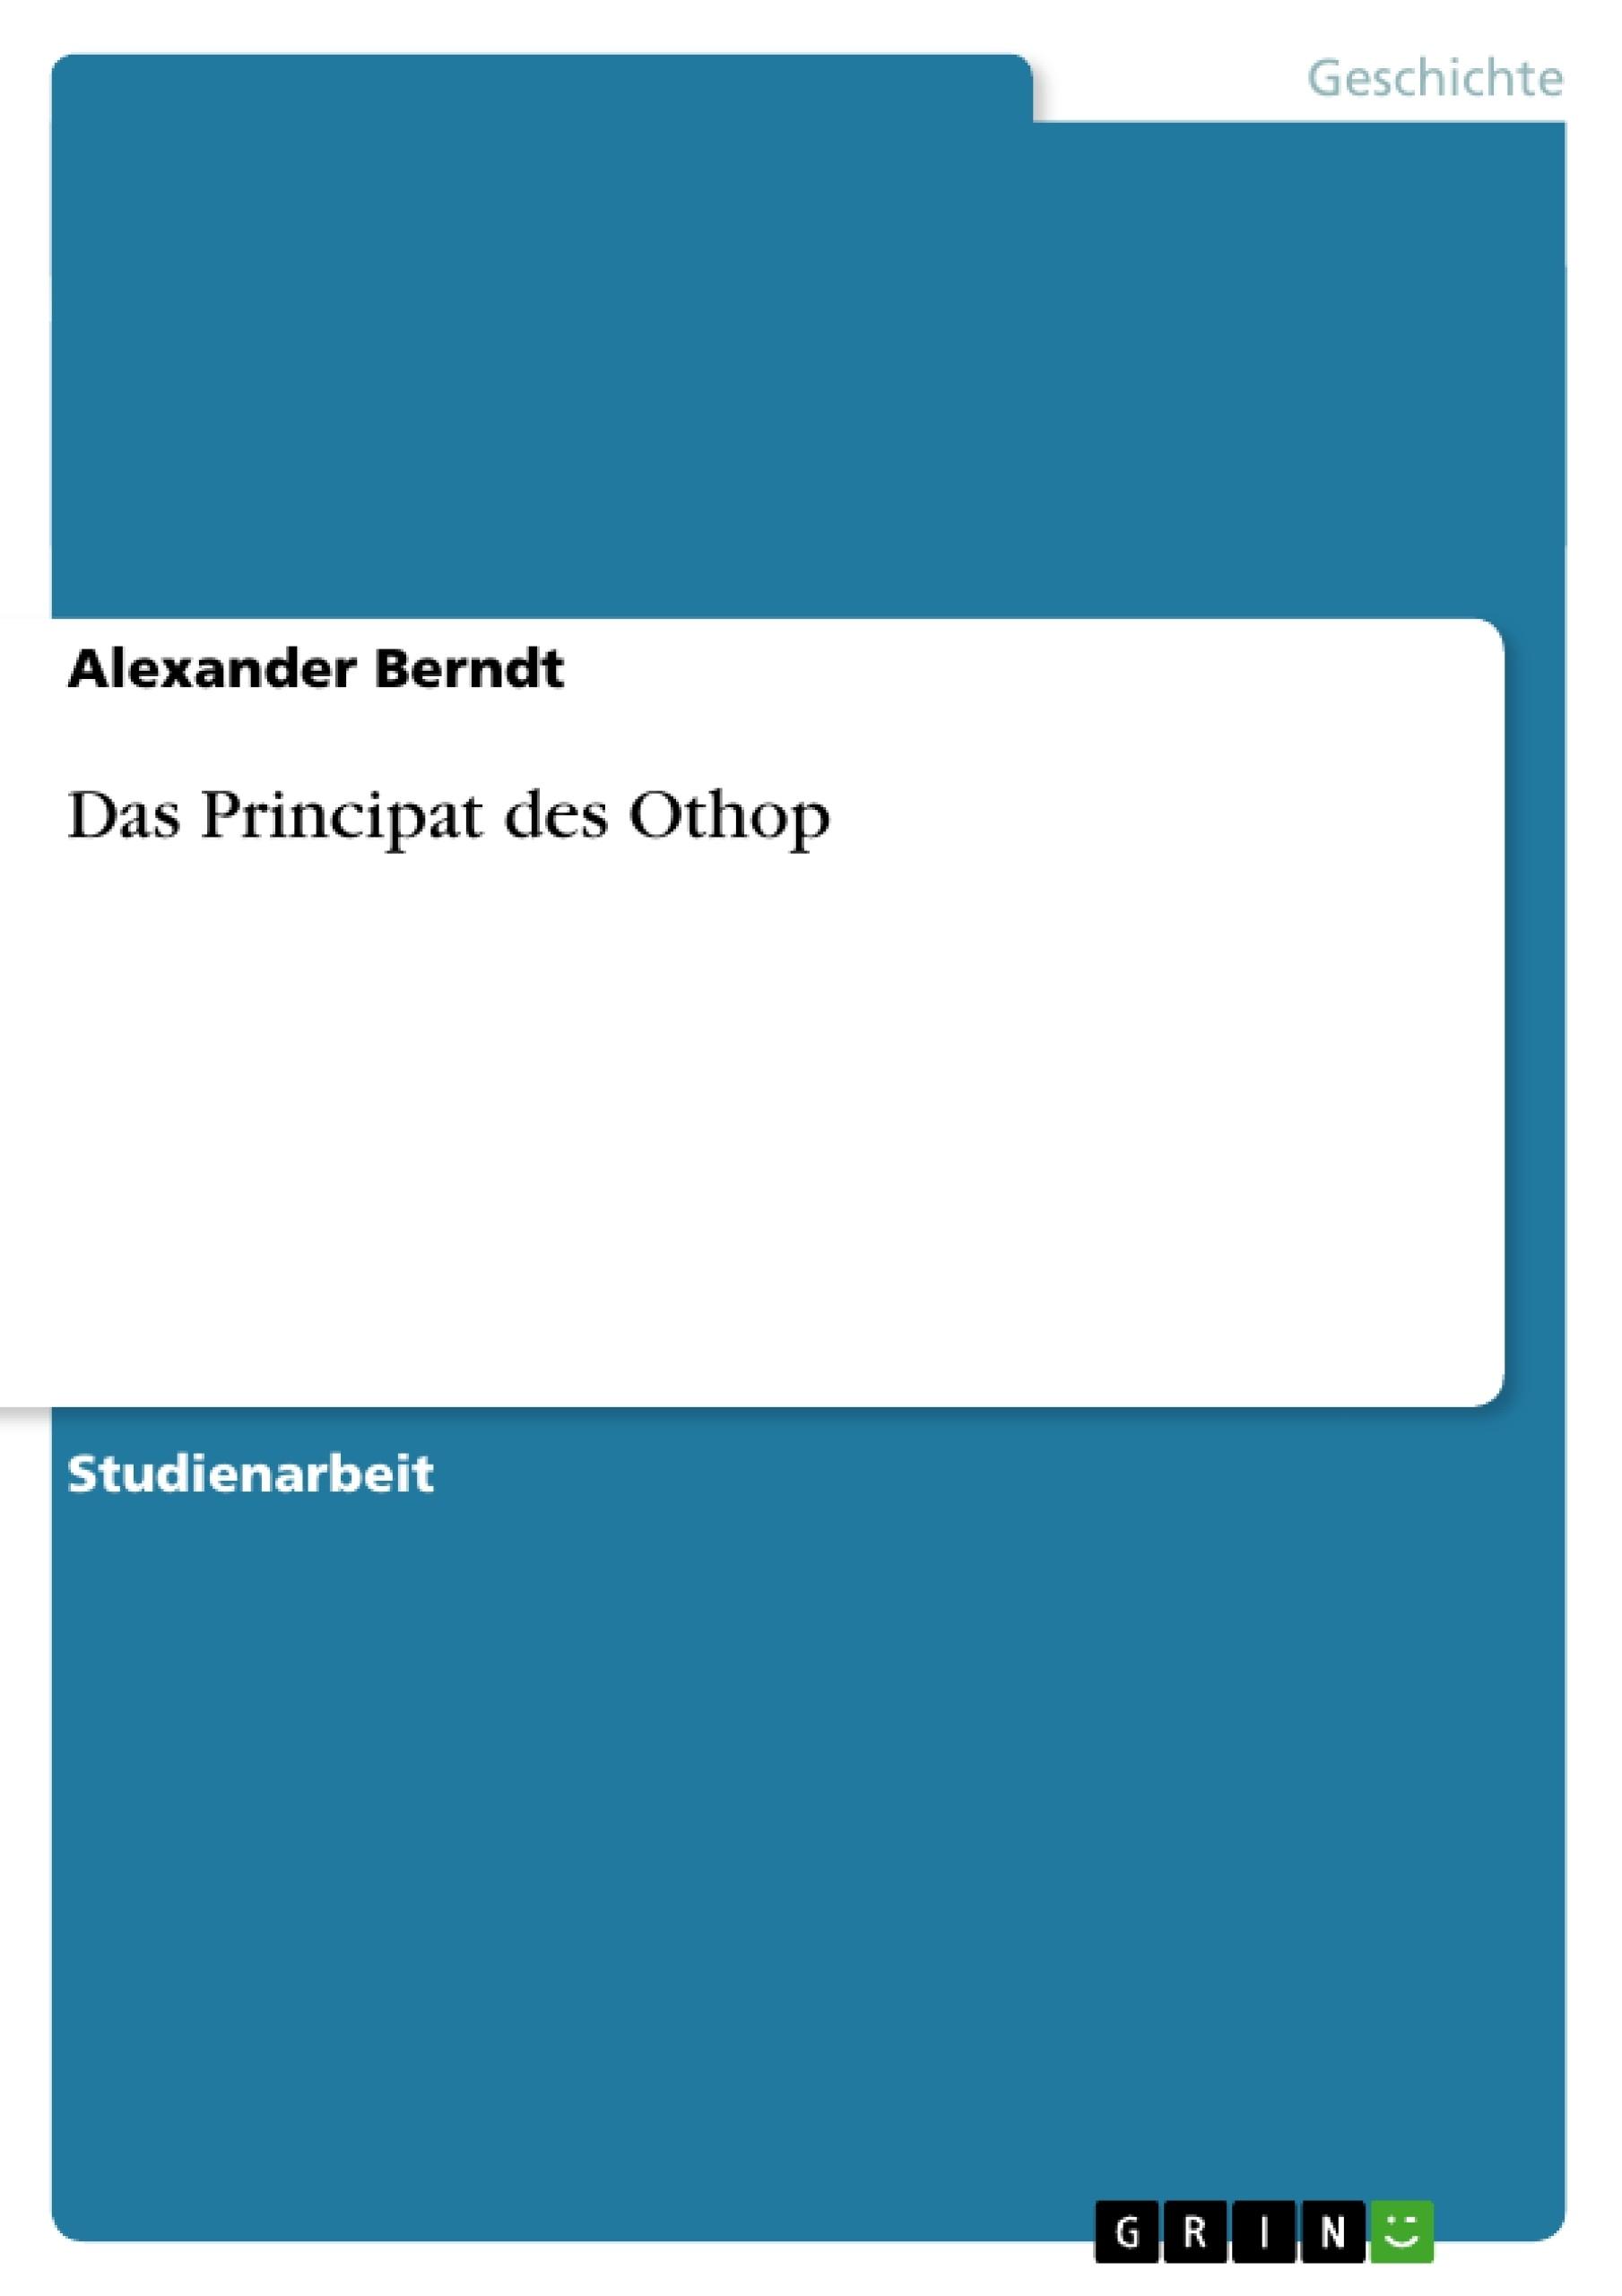 Titel: Das Principat des Othop